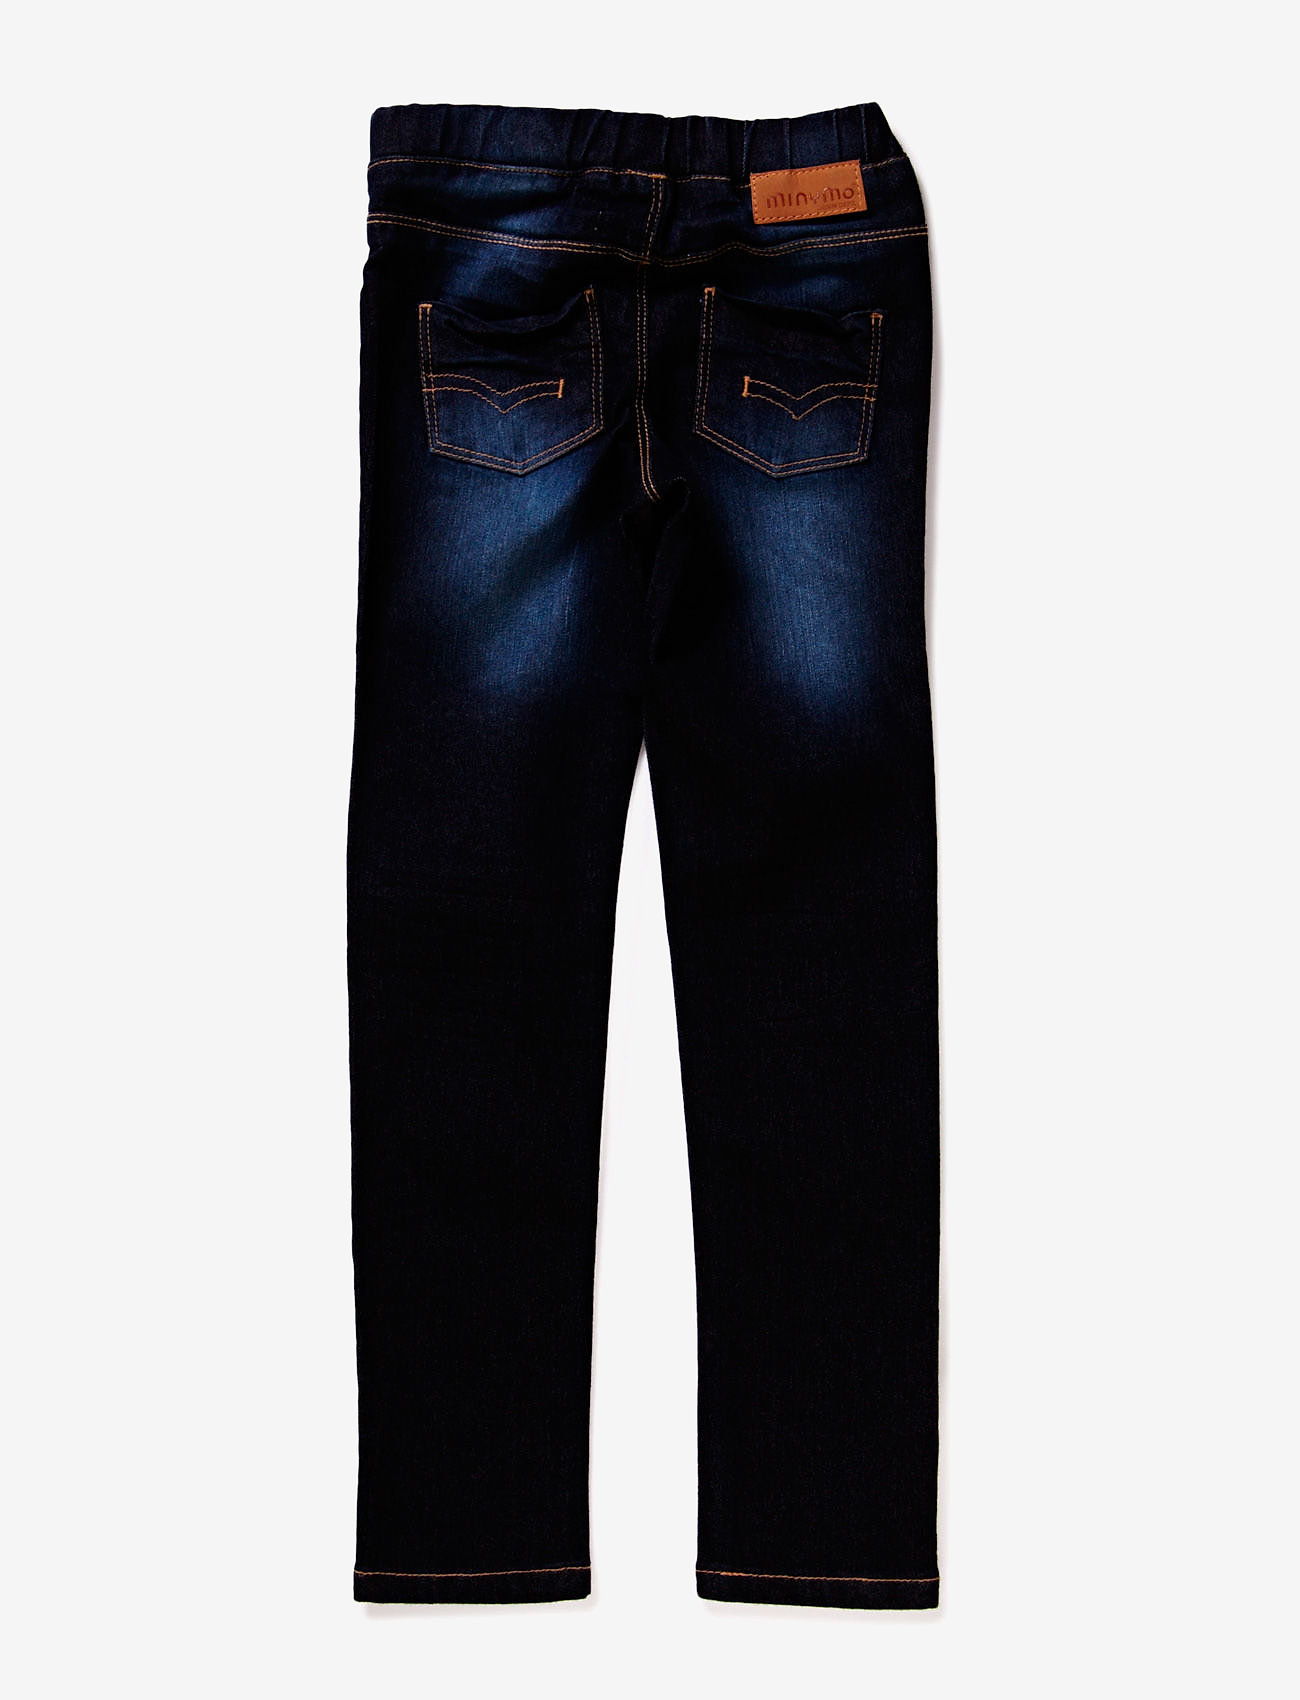 Minymo - Jeans girl - Slim fit - jeans - dark blue denim - 1